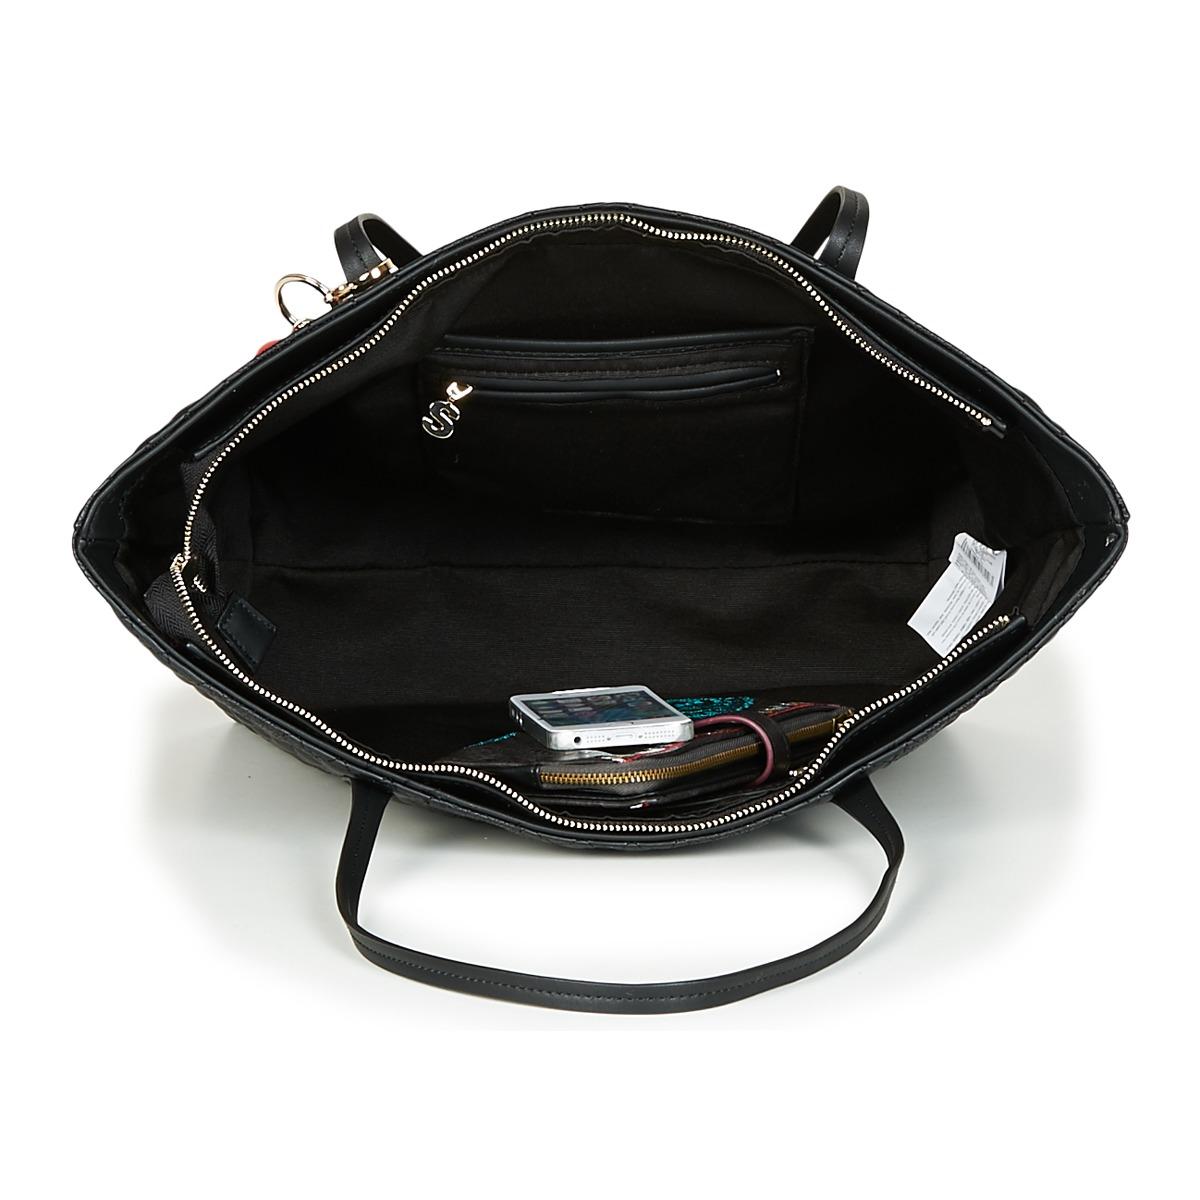 Claudia Zipper Bols Borsa 8001308 Shopping Donna Desigual Capri vm8n0NwO